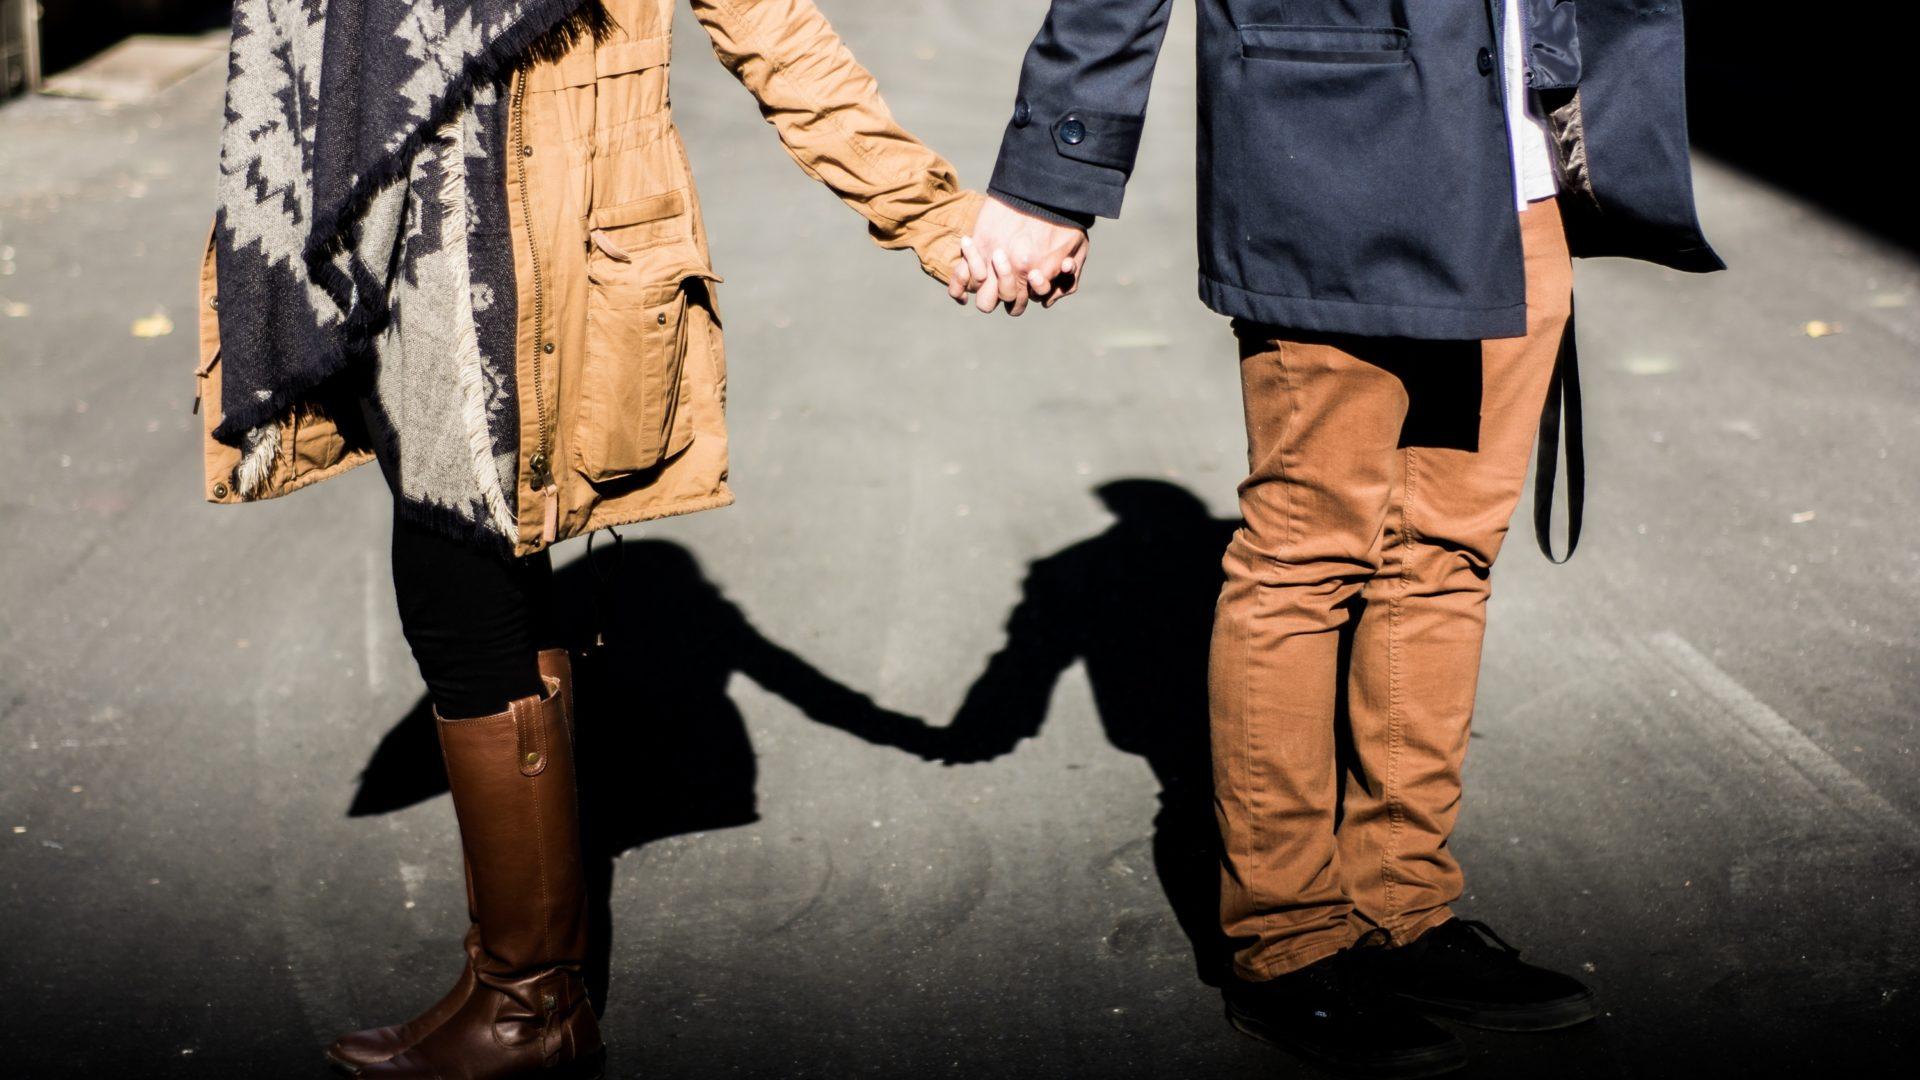 Our Spouse, A Suitable Helper Hero Image